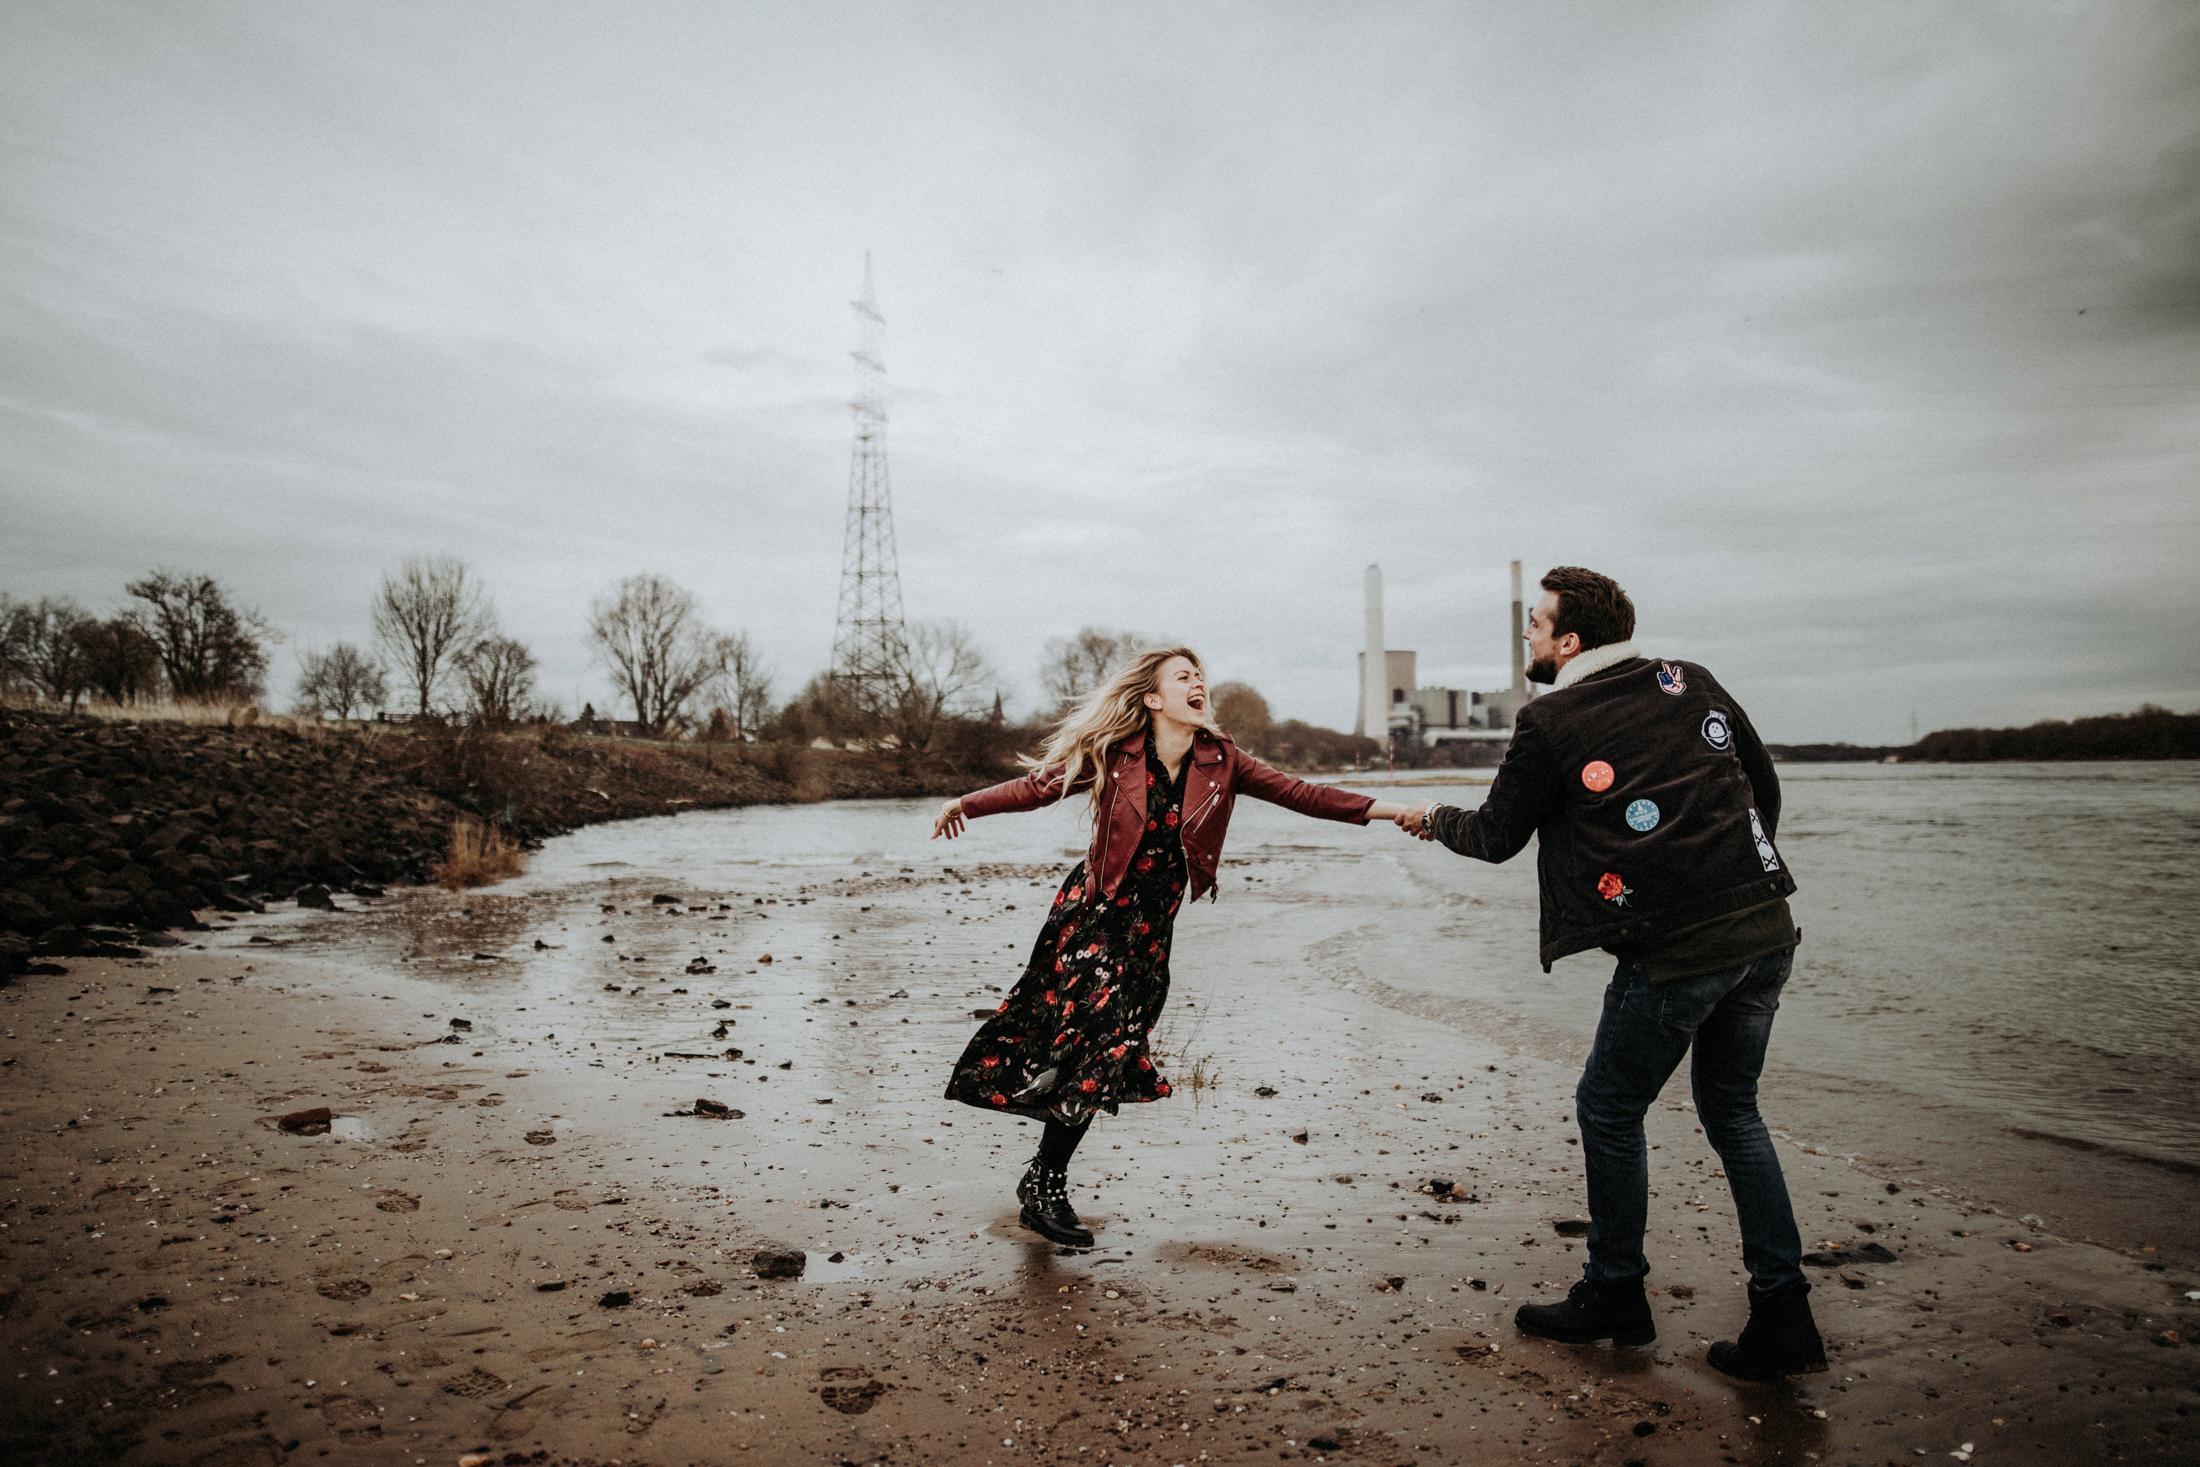 Wedding_Photographer_Mallorca_DanielaMarquardt_Photography_CanaryIslands_Lanzarote_Iceland_Tuscany_Santorini_Portugal_NewYork_Spain_Elopement_Hochzeitsfotograf_CK48